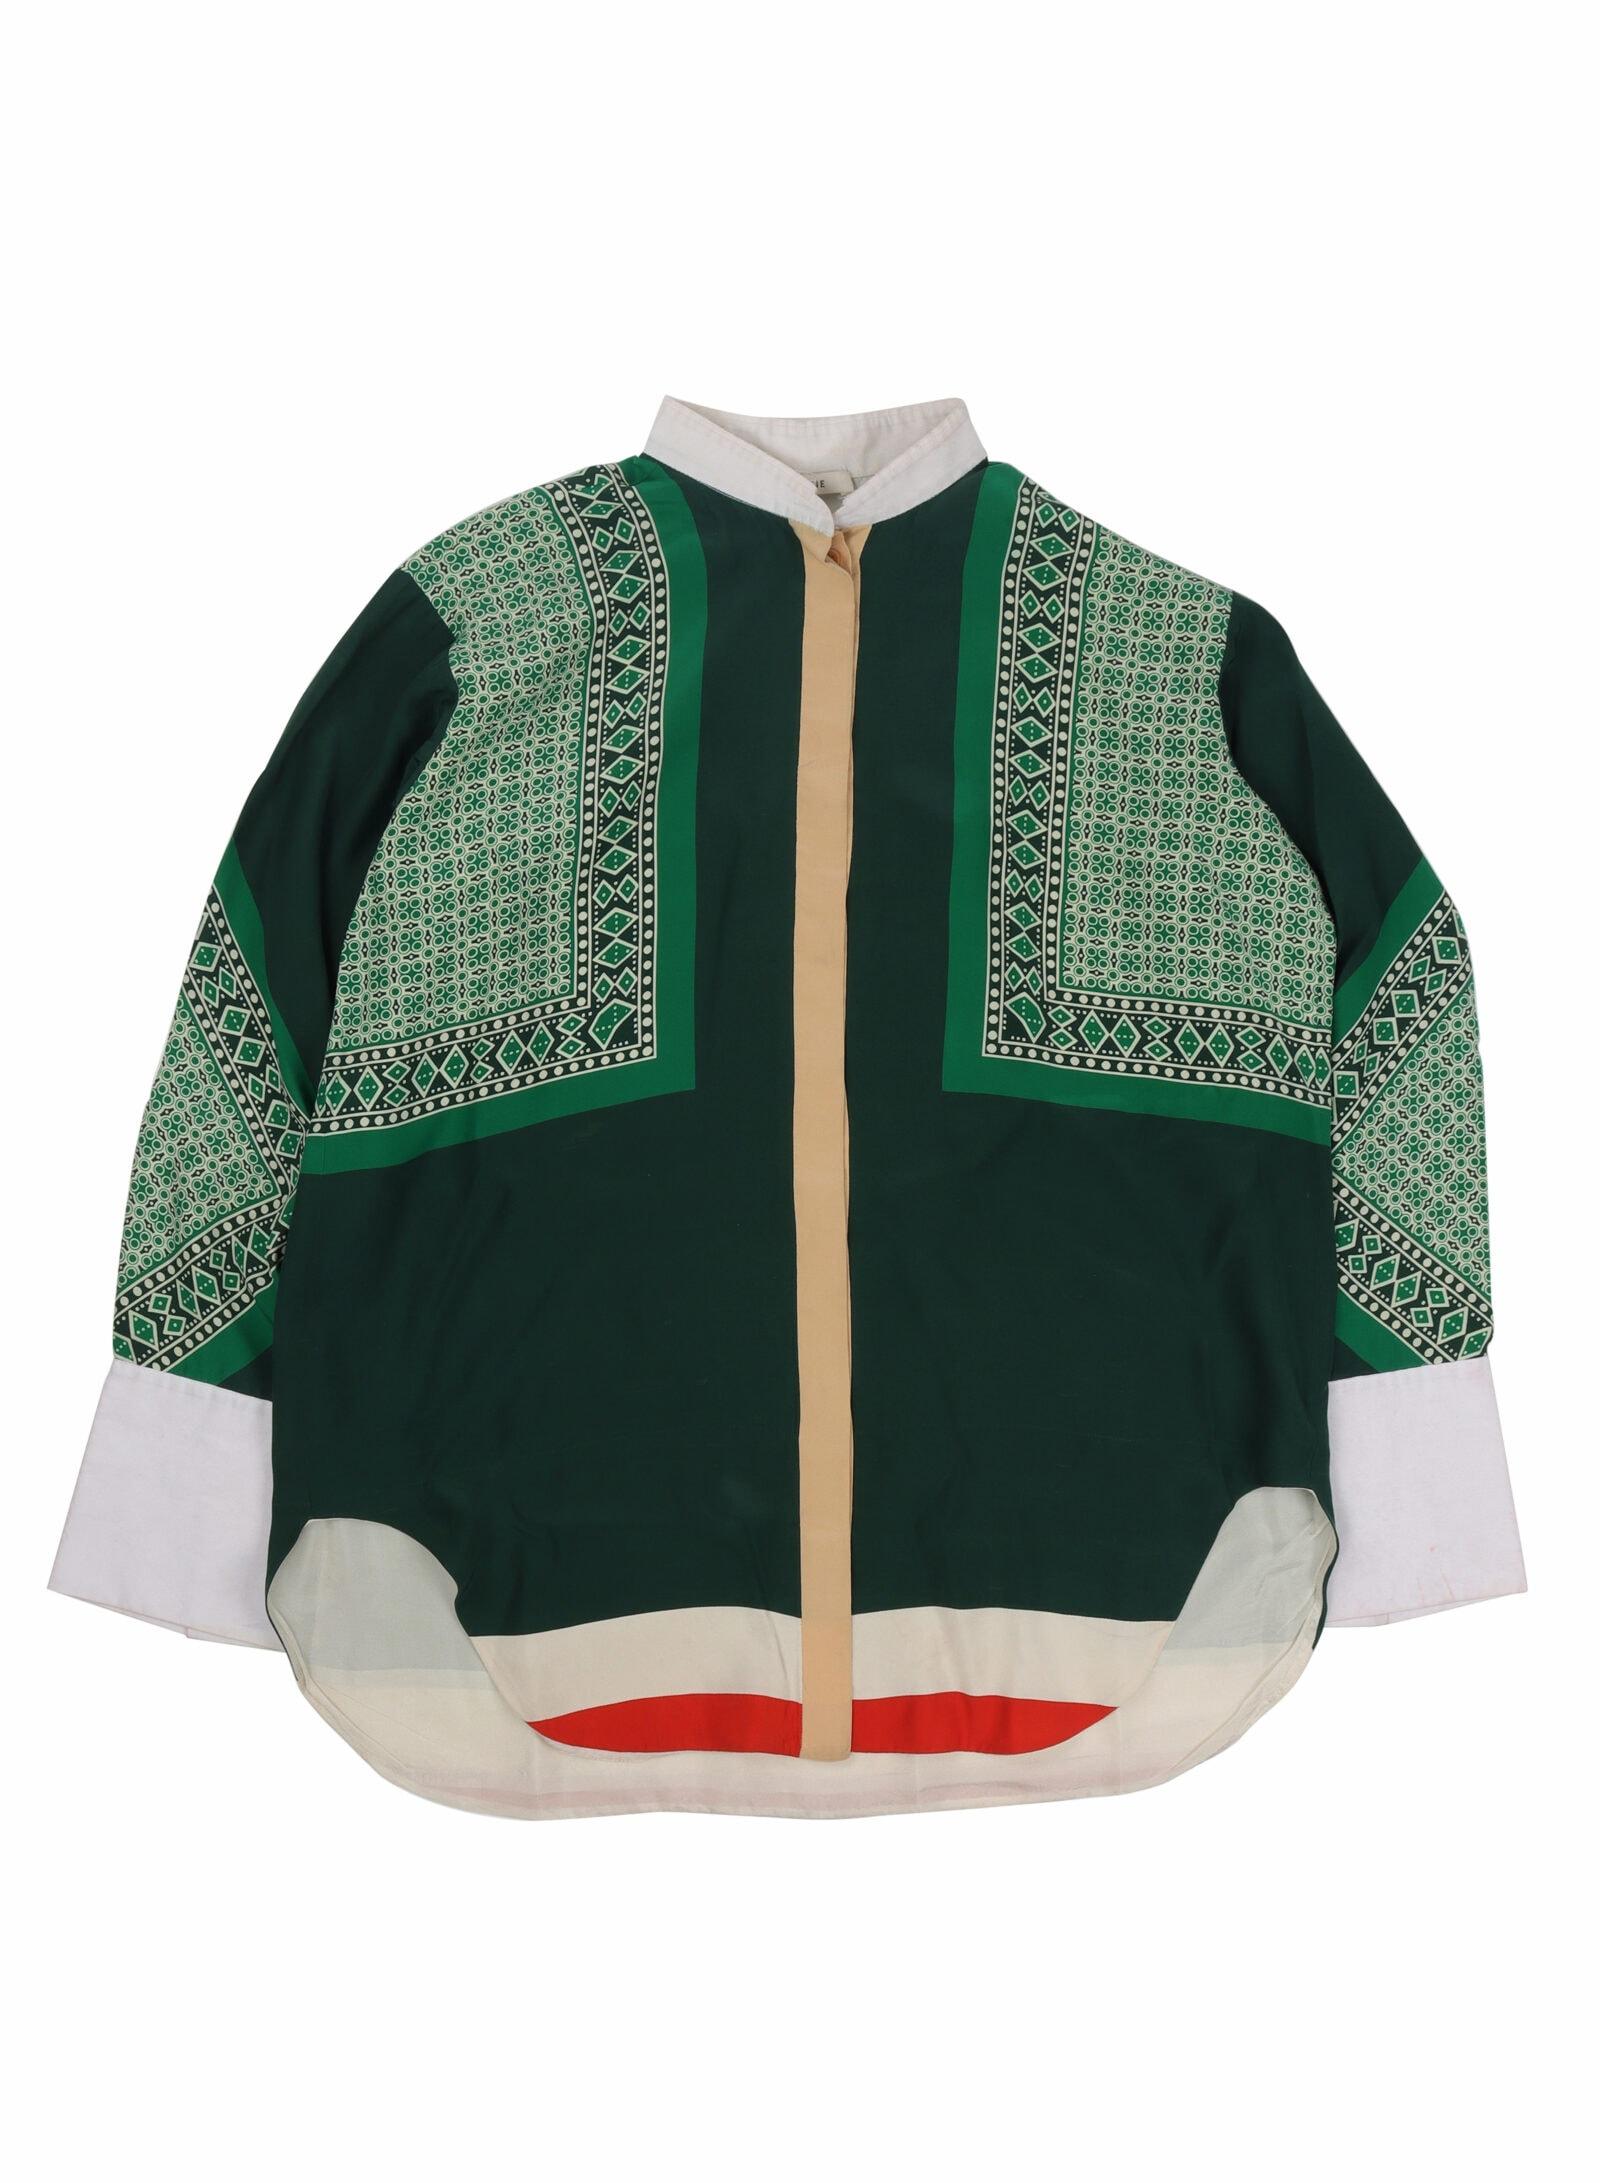 Celine Phoebe Philo S:S 2011 Silk Shirt copy